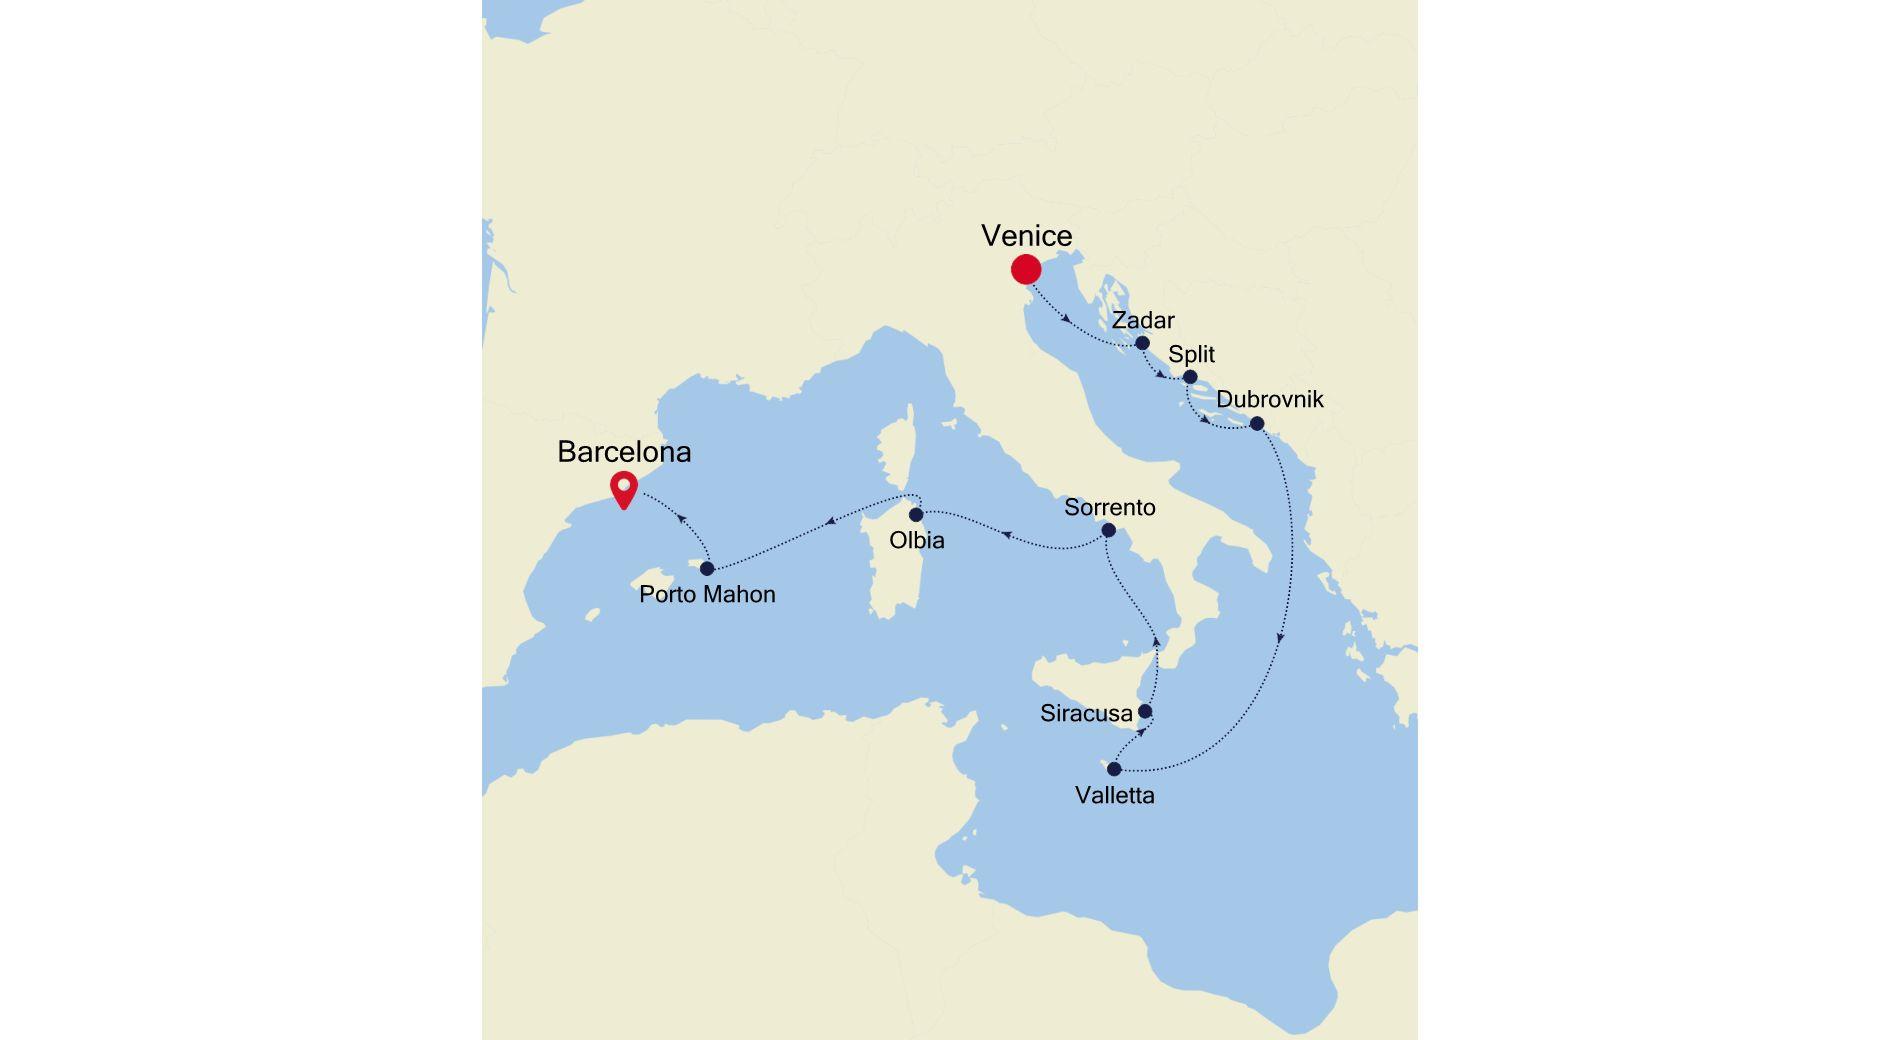 SS200618010 - Venice to Barcelona